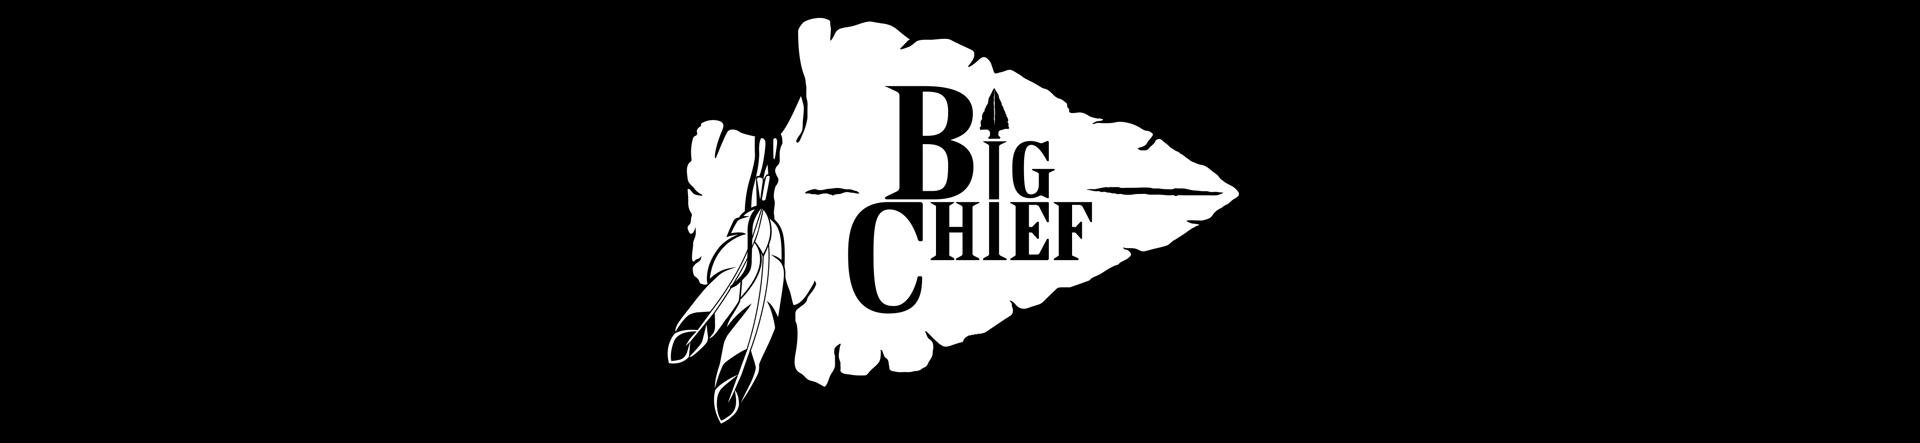 Armoric_big-chief